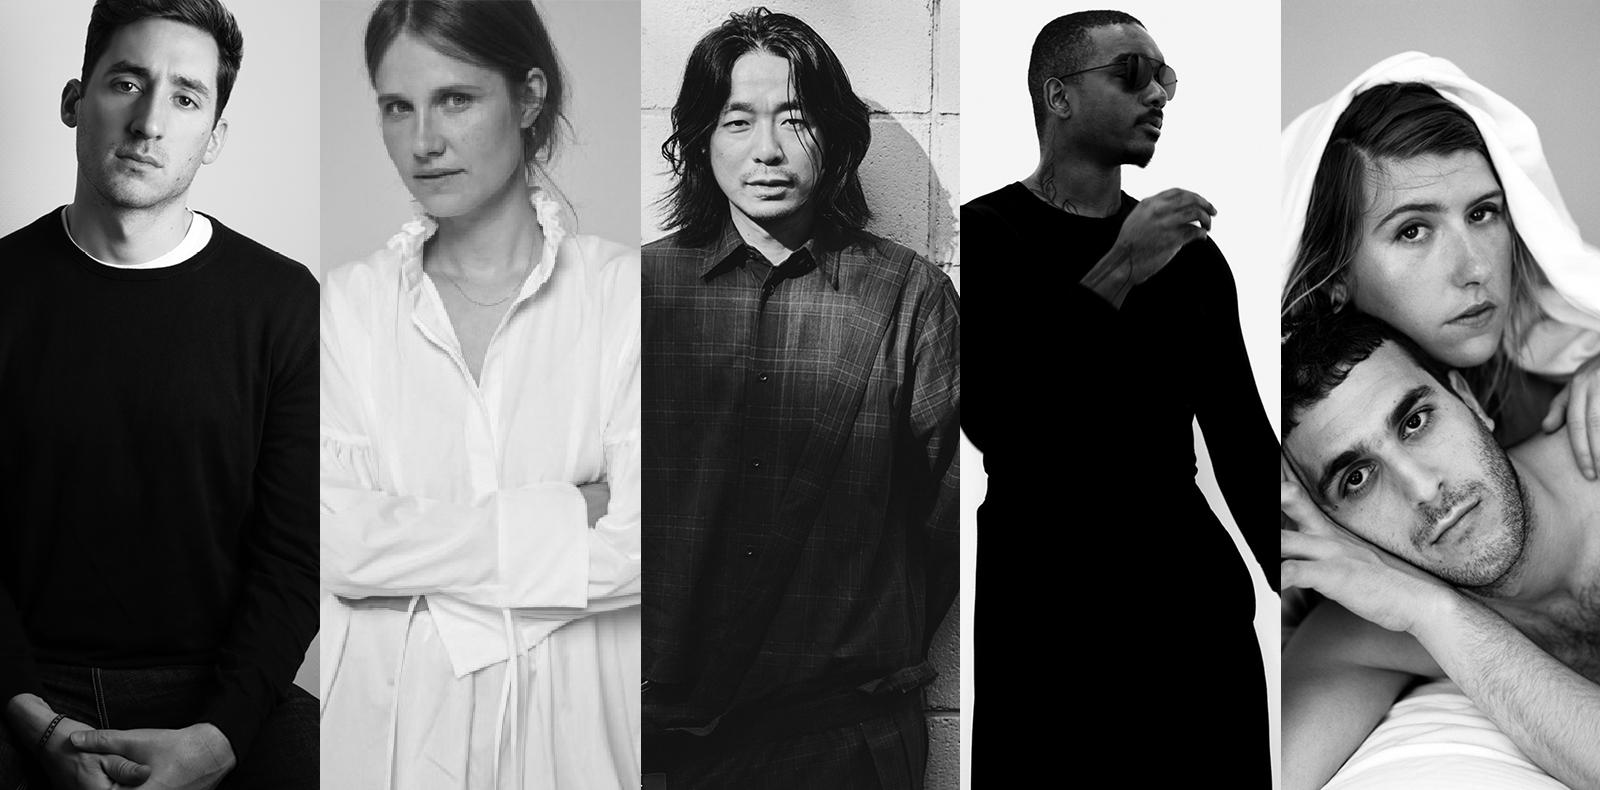 Antonin Tron (Atlein), Cecile Bahnsen, Hiromichi Ochiai (Facetasm), Samuel Ross (A cold wall),  Zoe Latta & Mike Eckhaus (Eckhaus Latta)